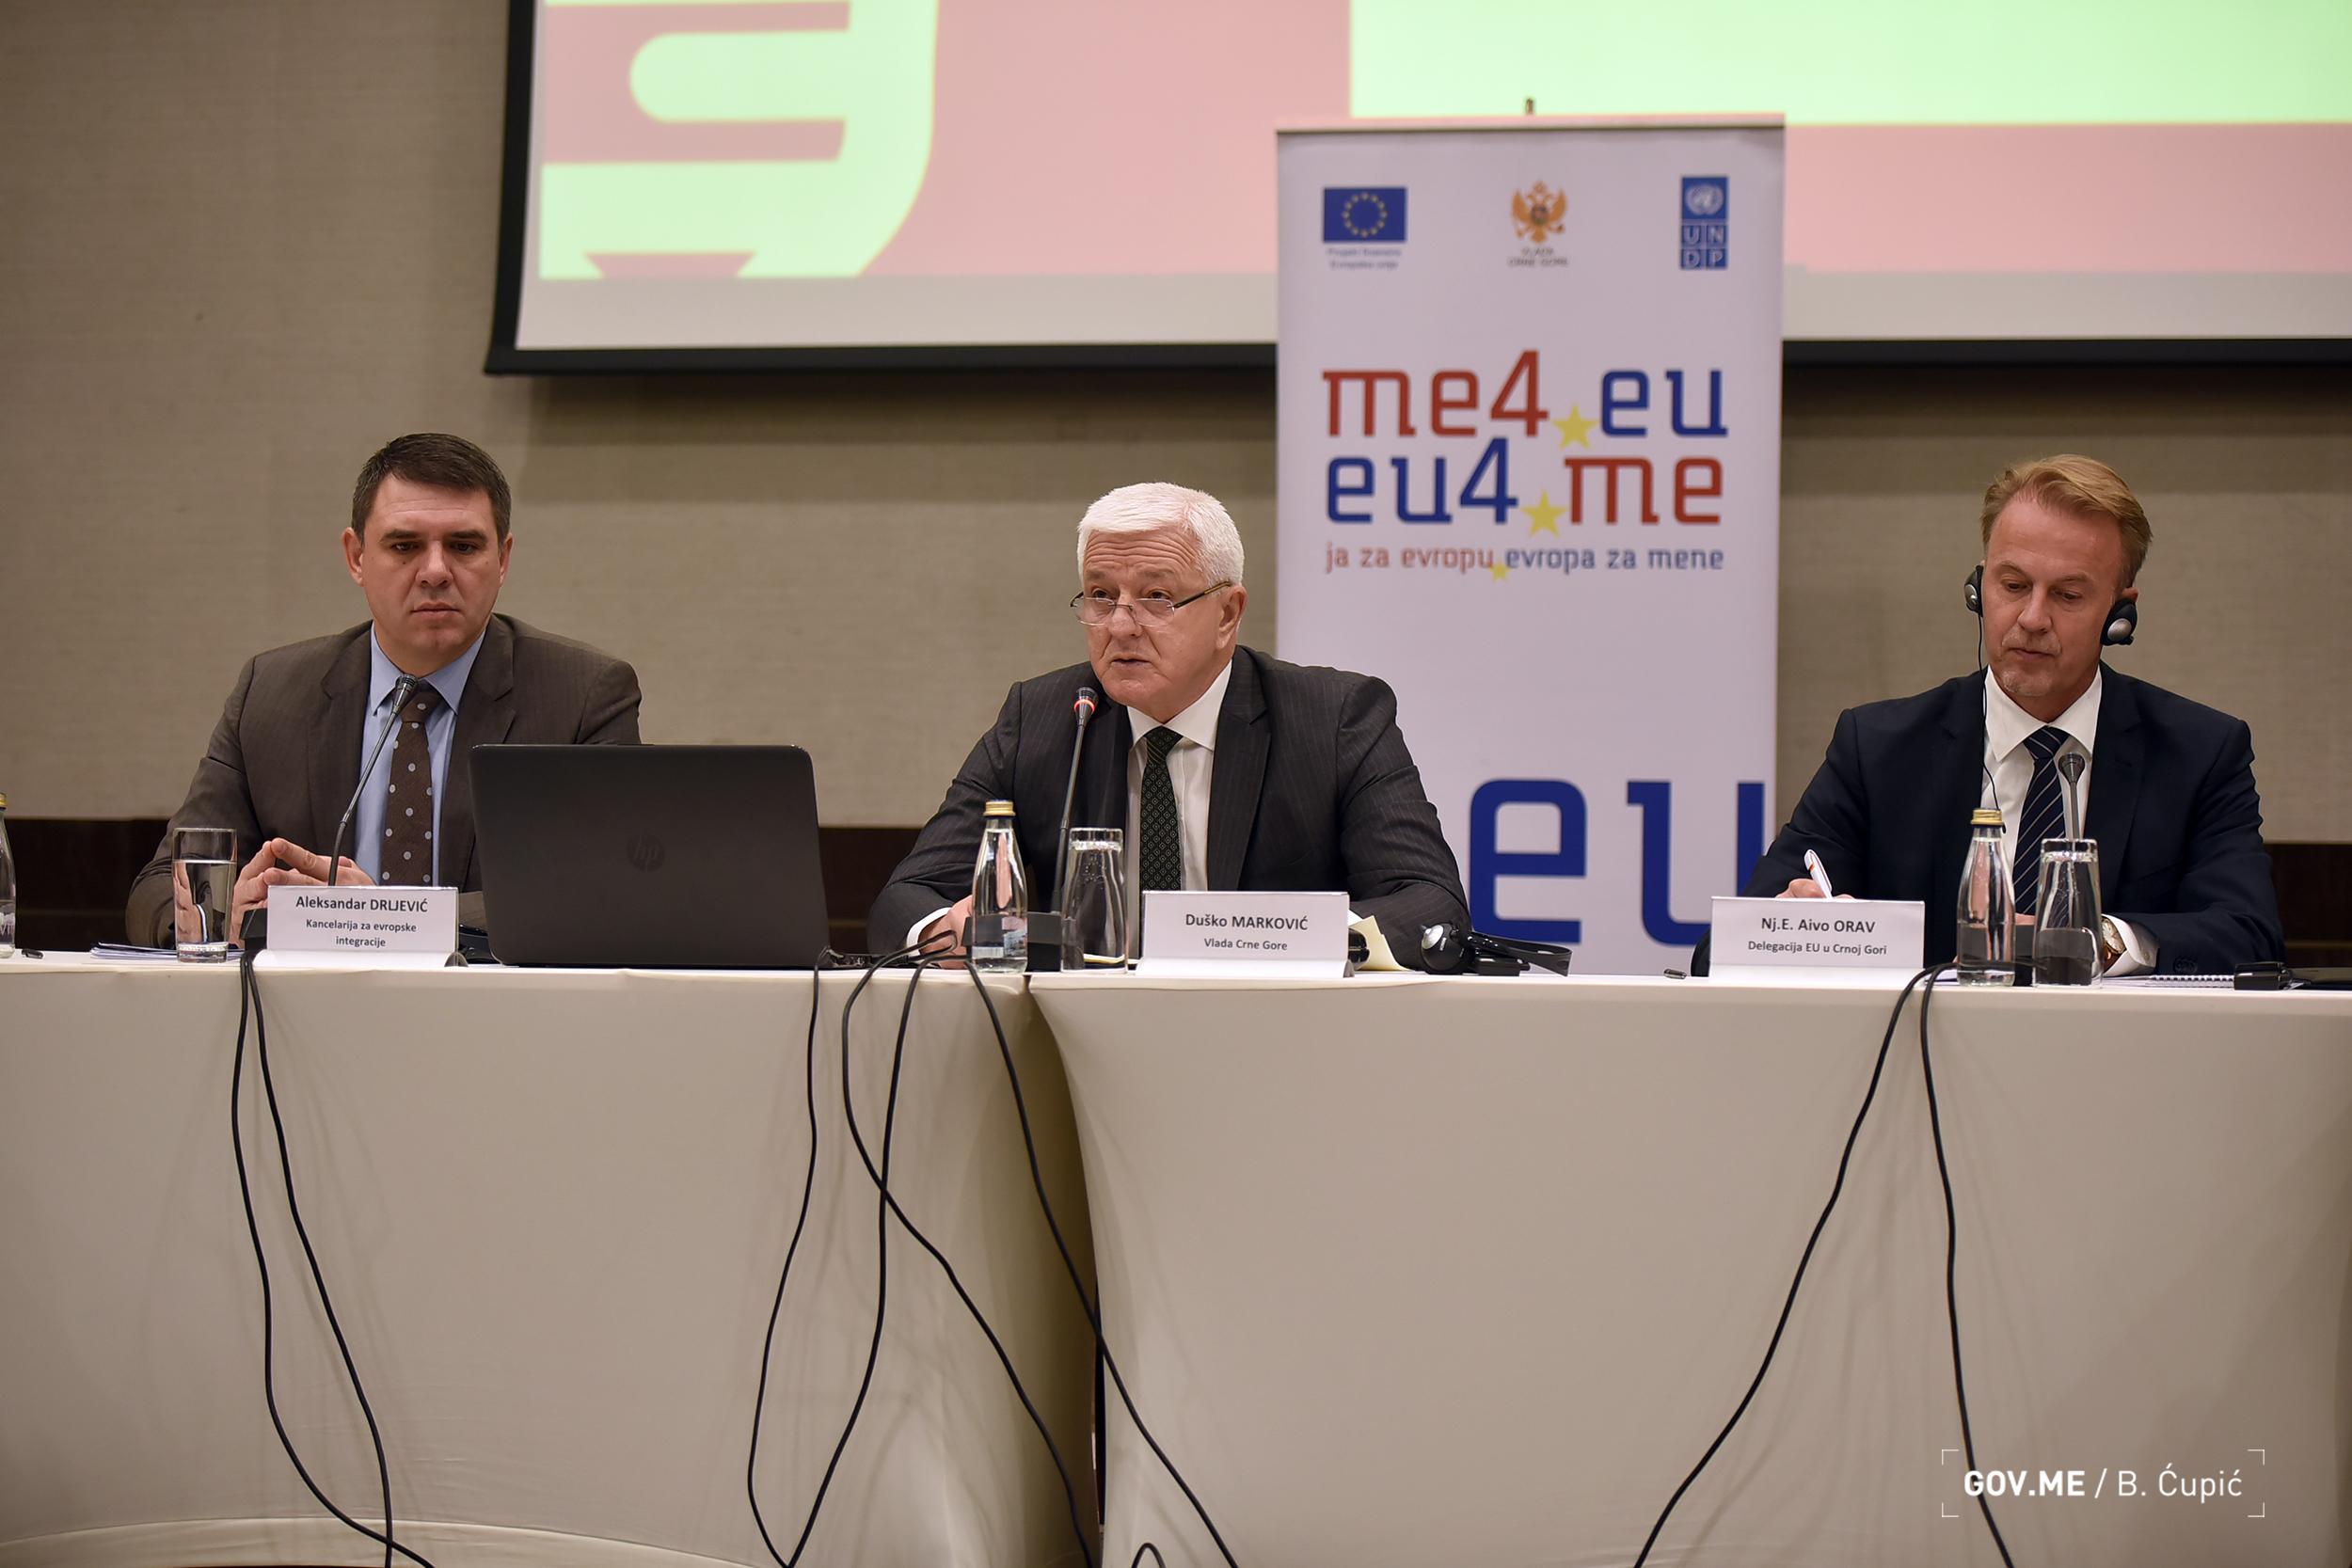 Drljević, Orav, Marković